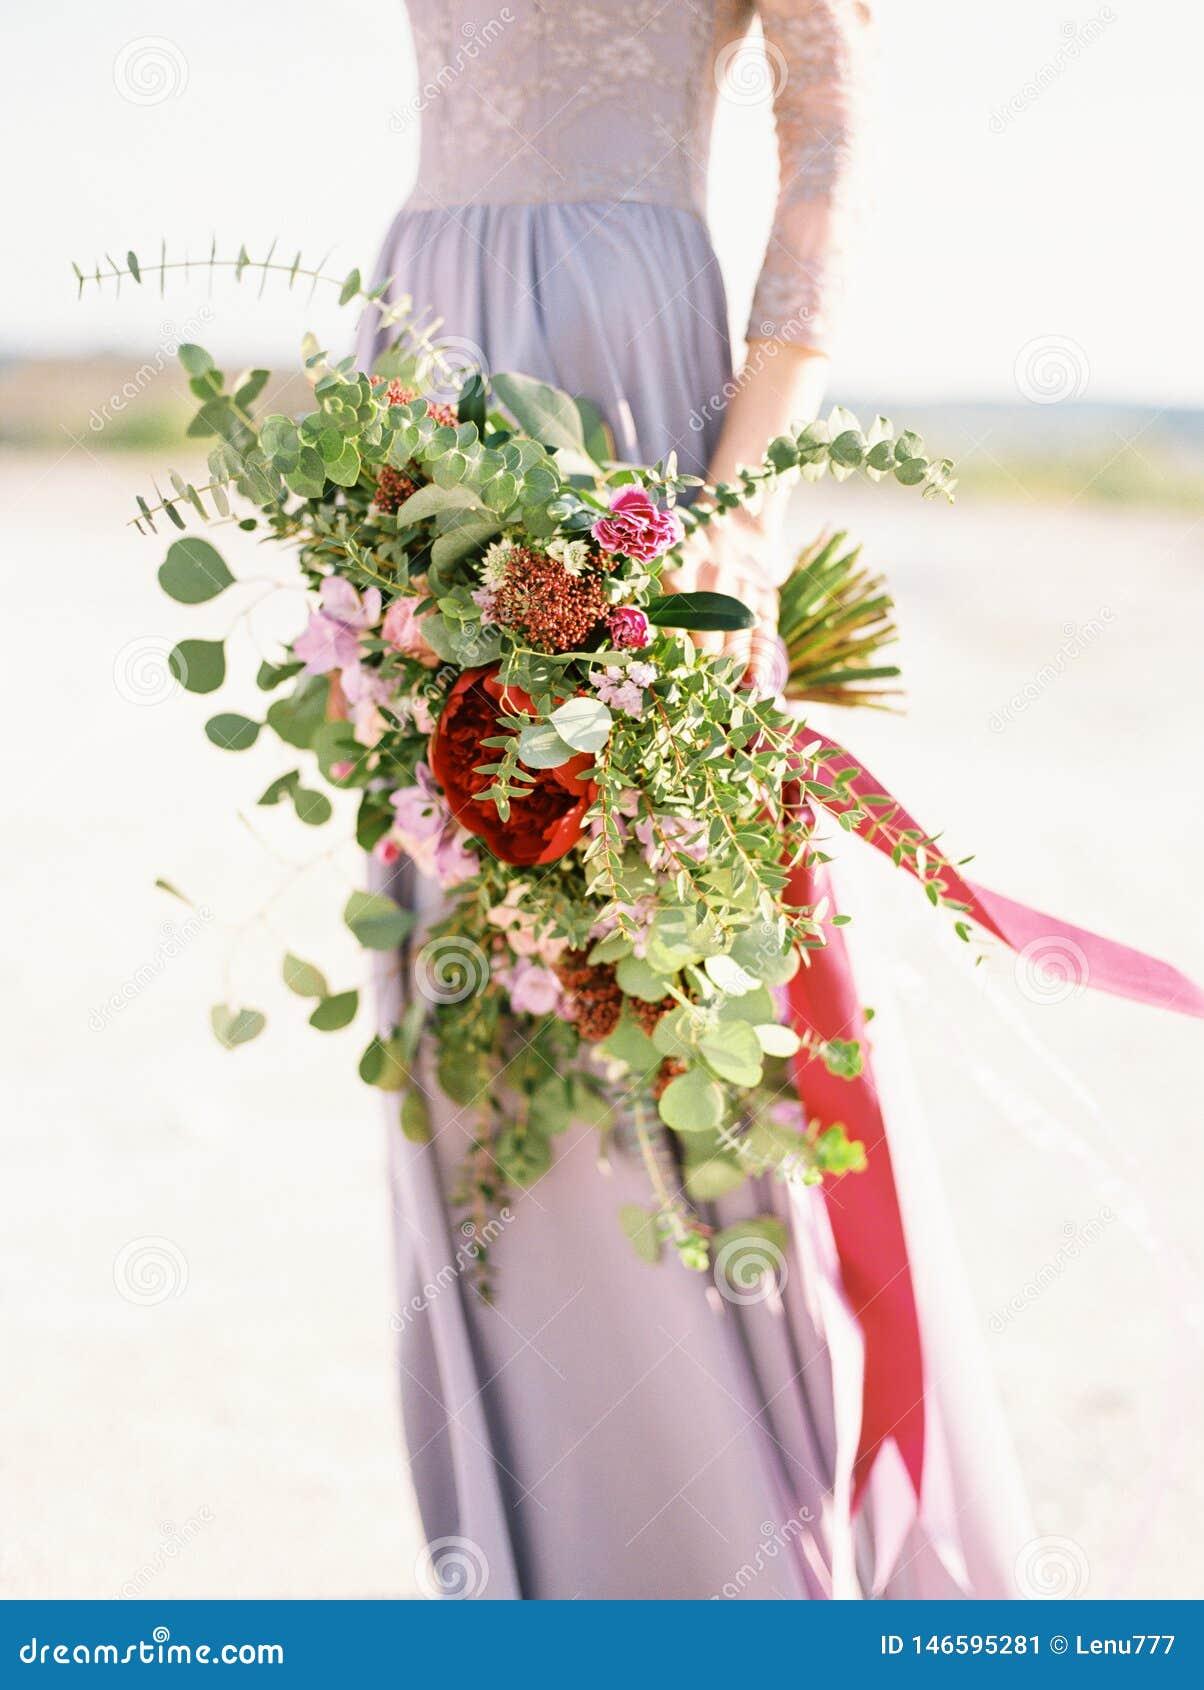 Bride Lavender Wedding Dress Holding Wedding Bouquet Boho Style